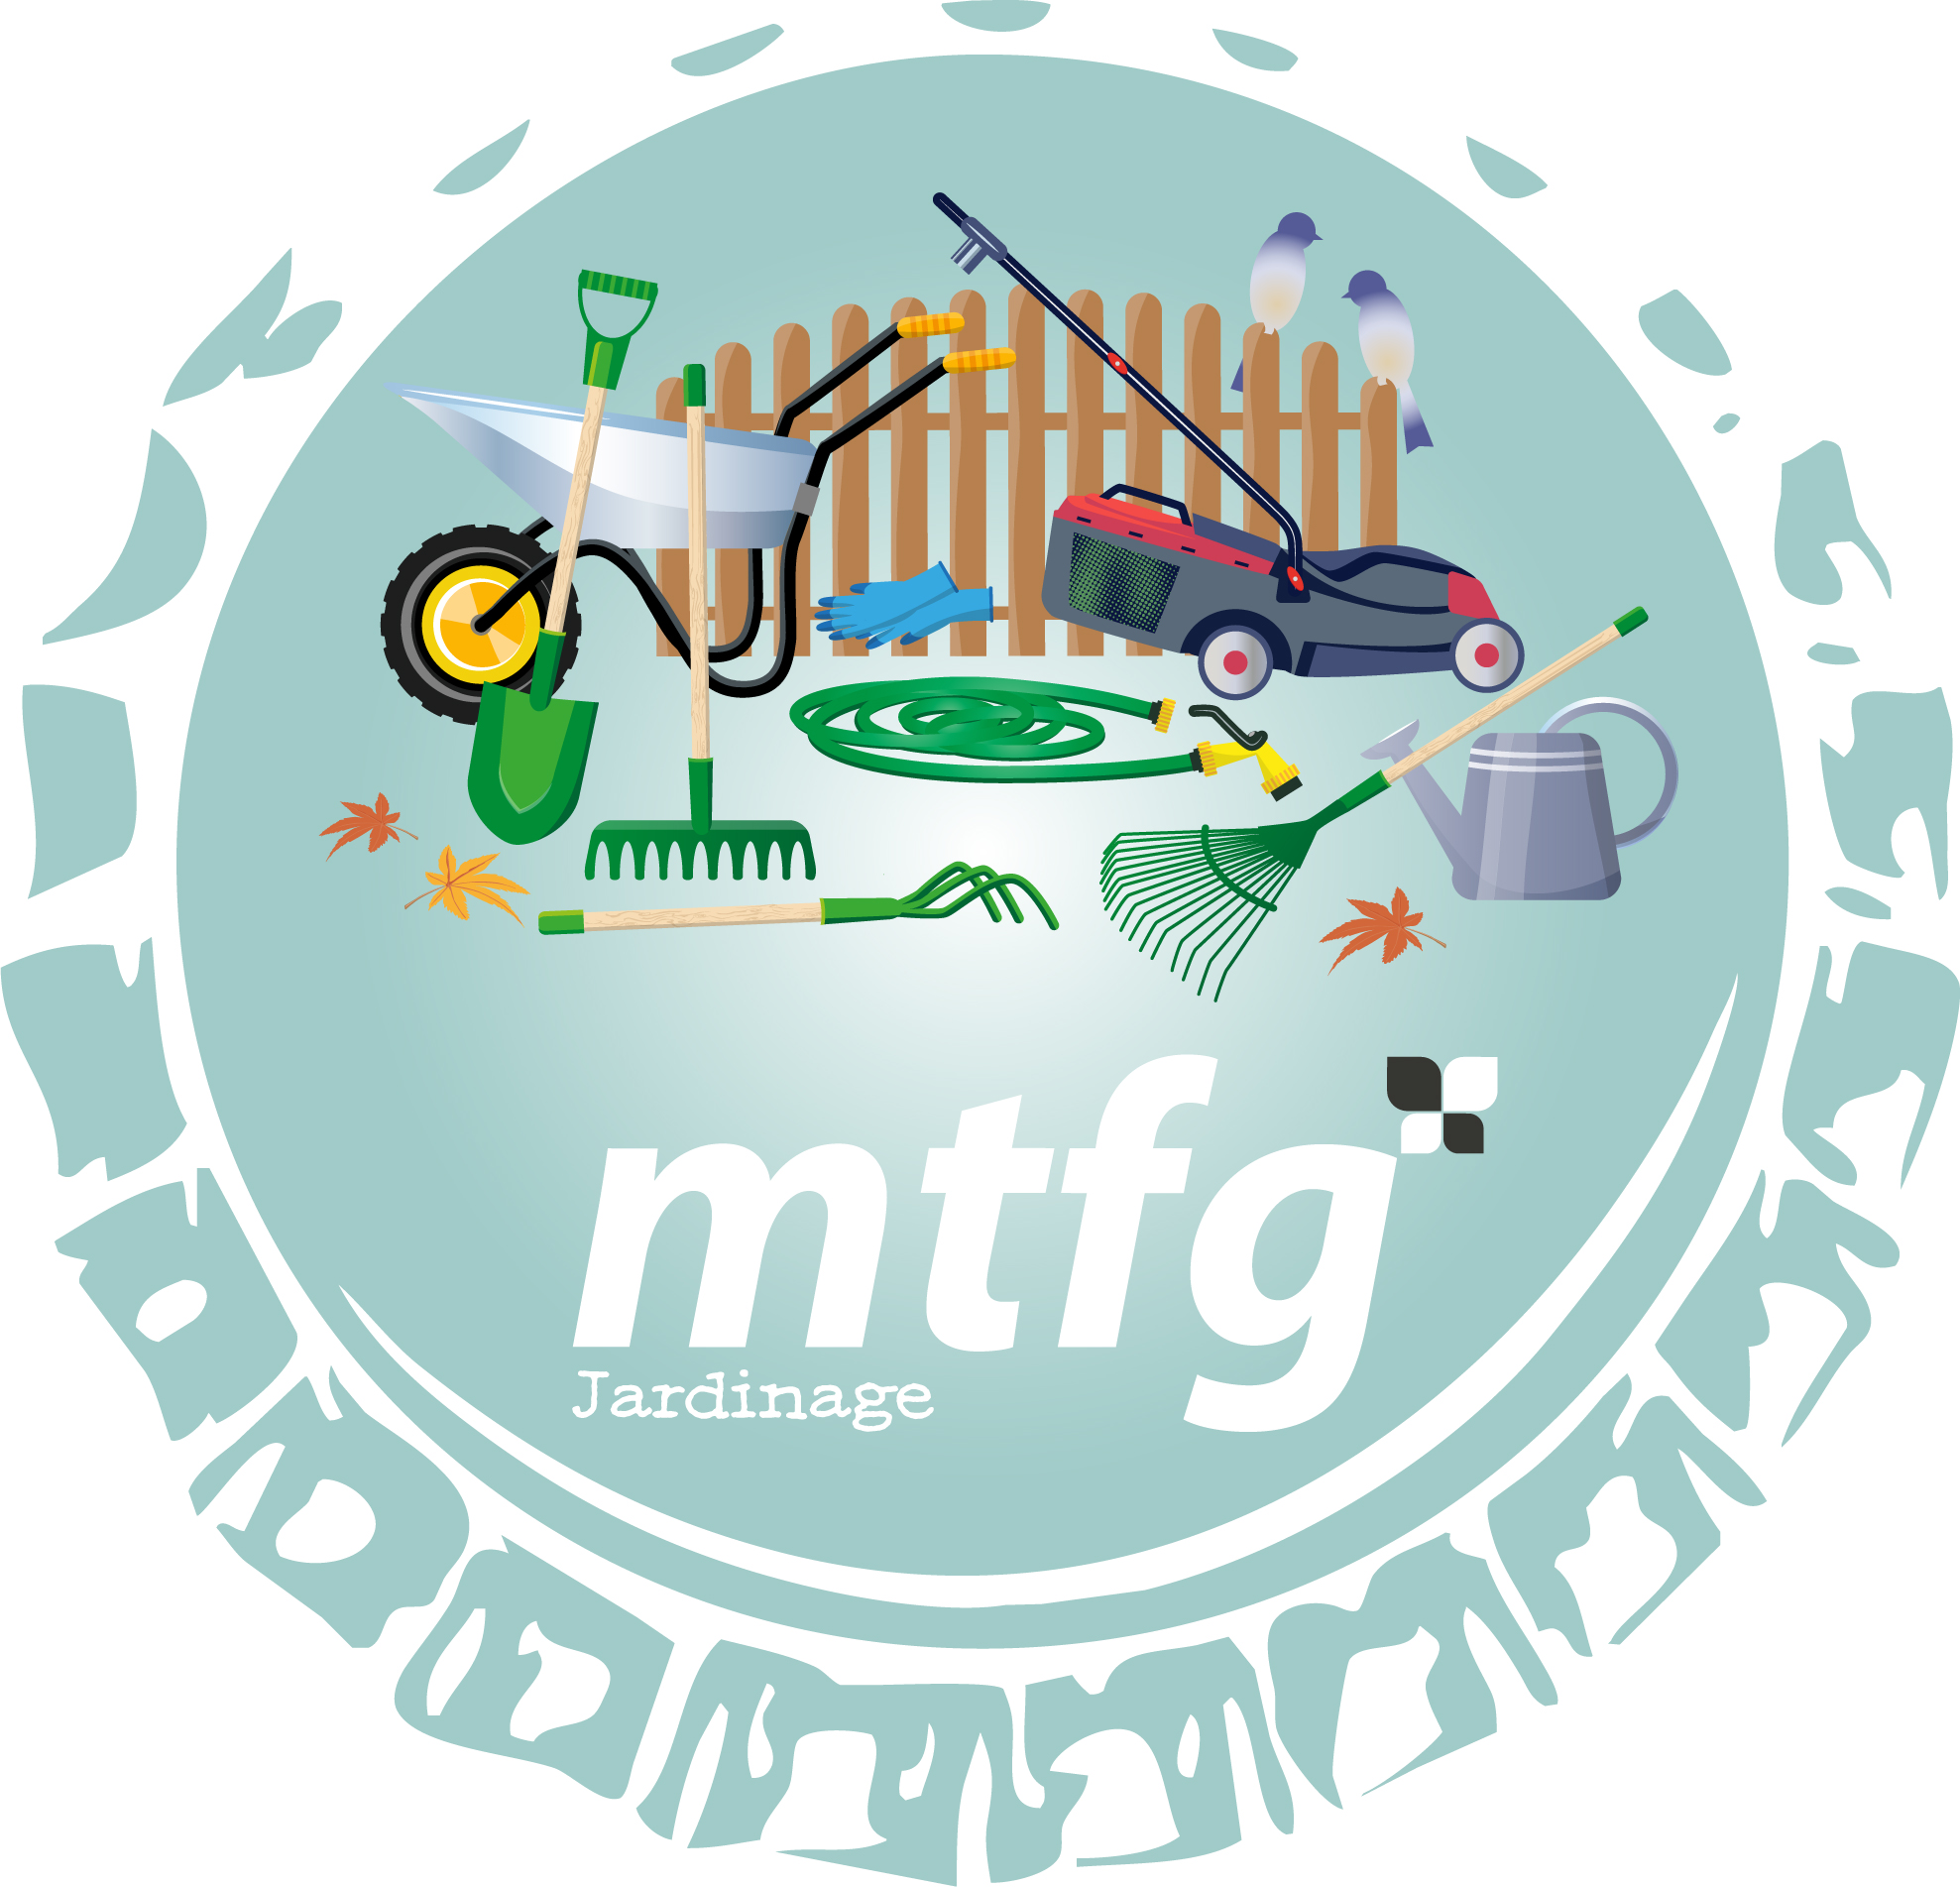 MTFG Jardinage